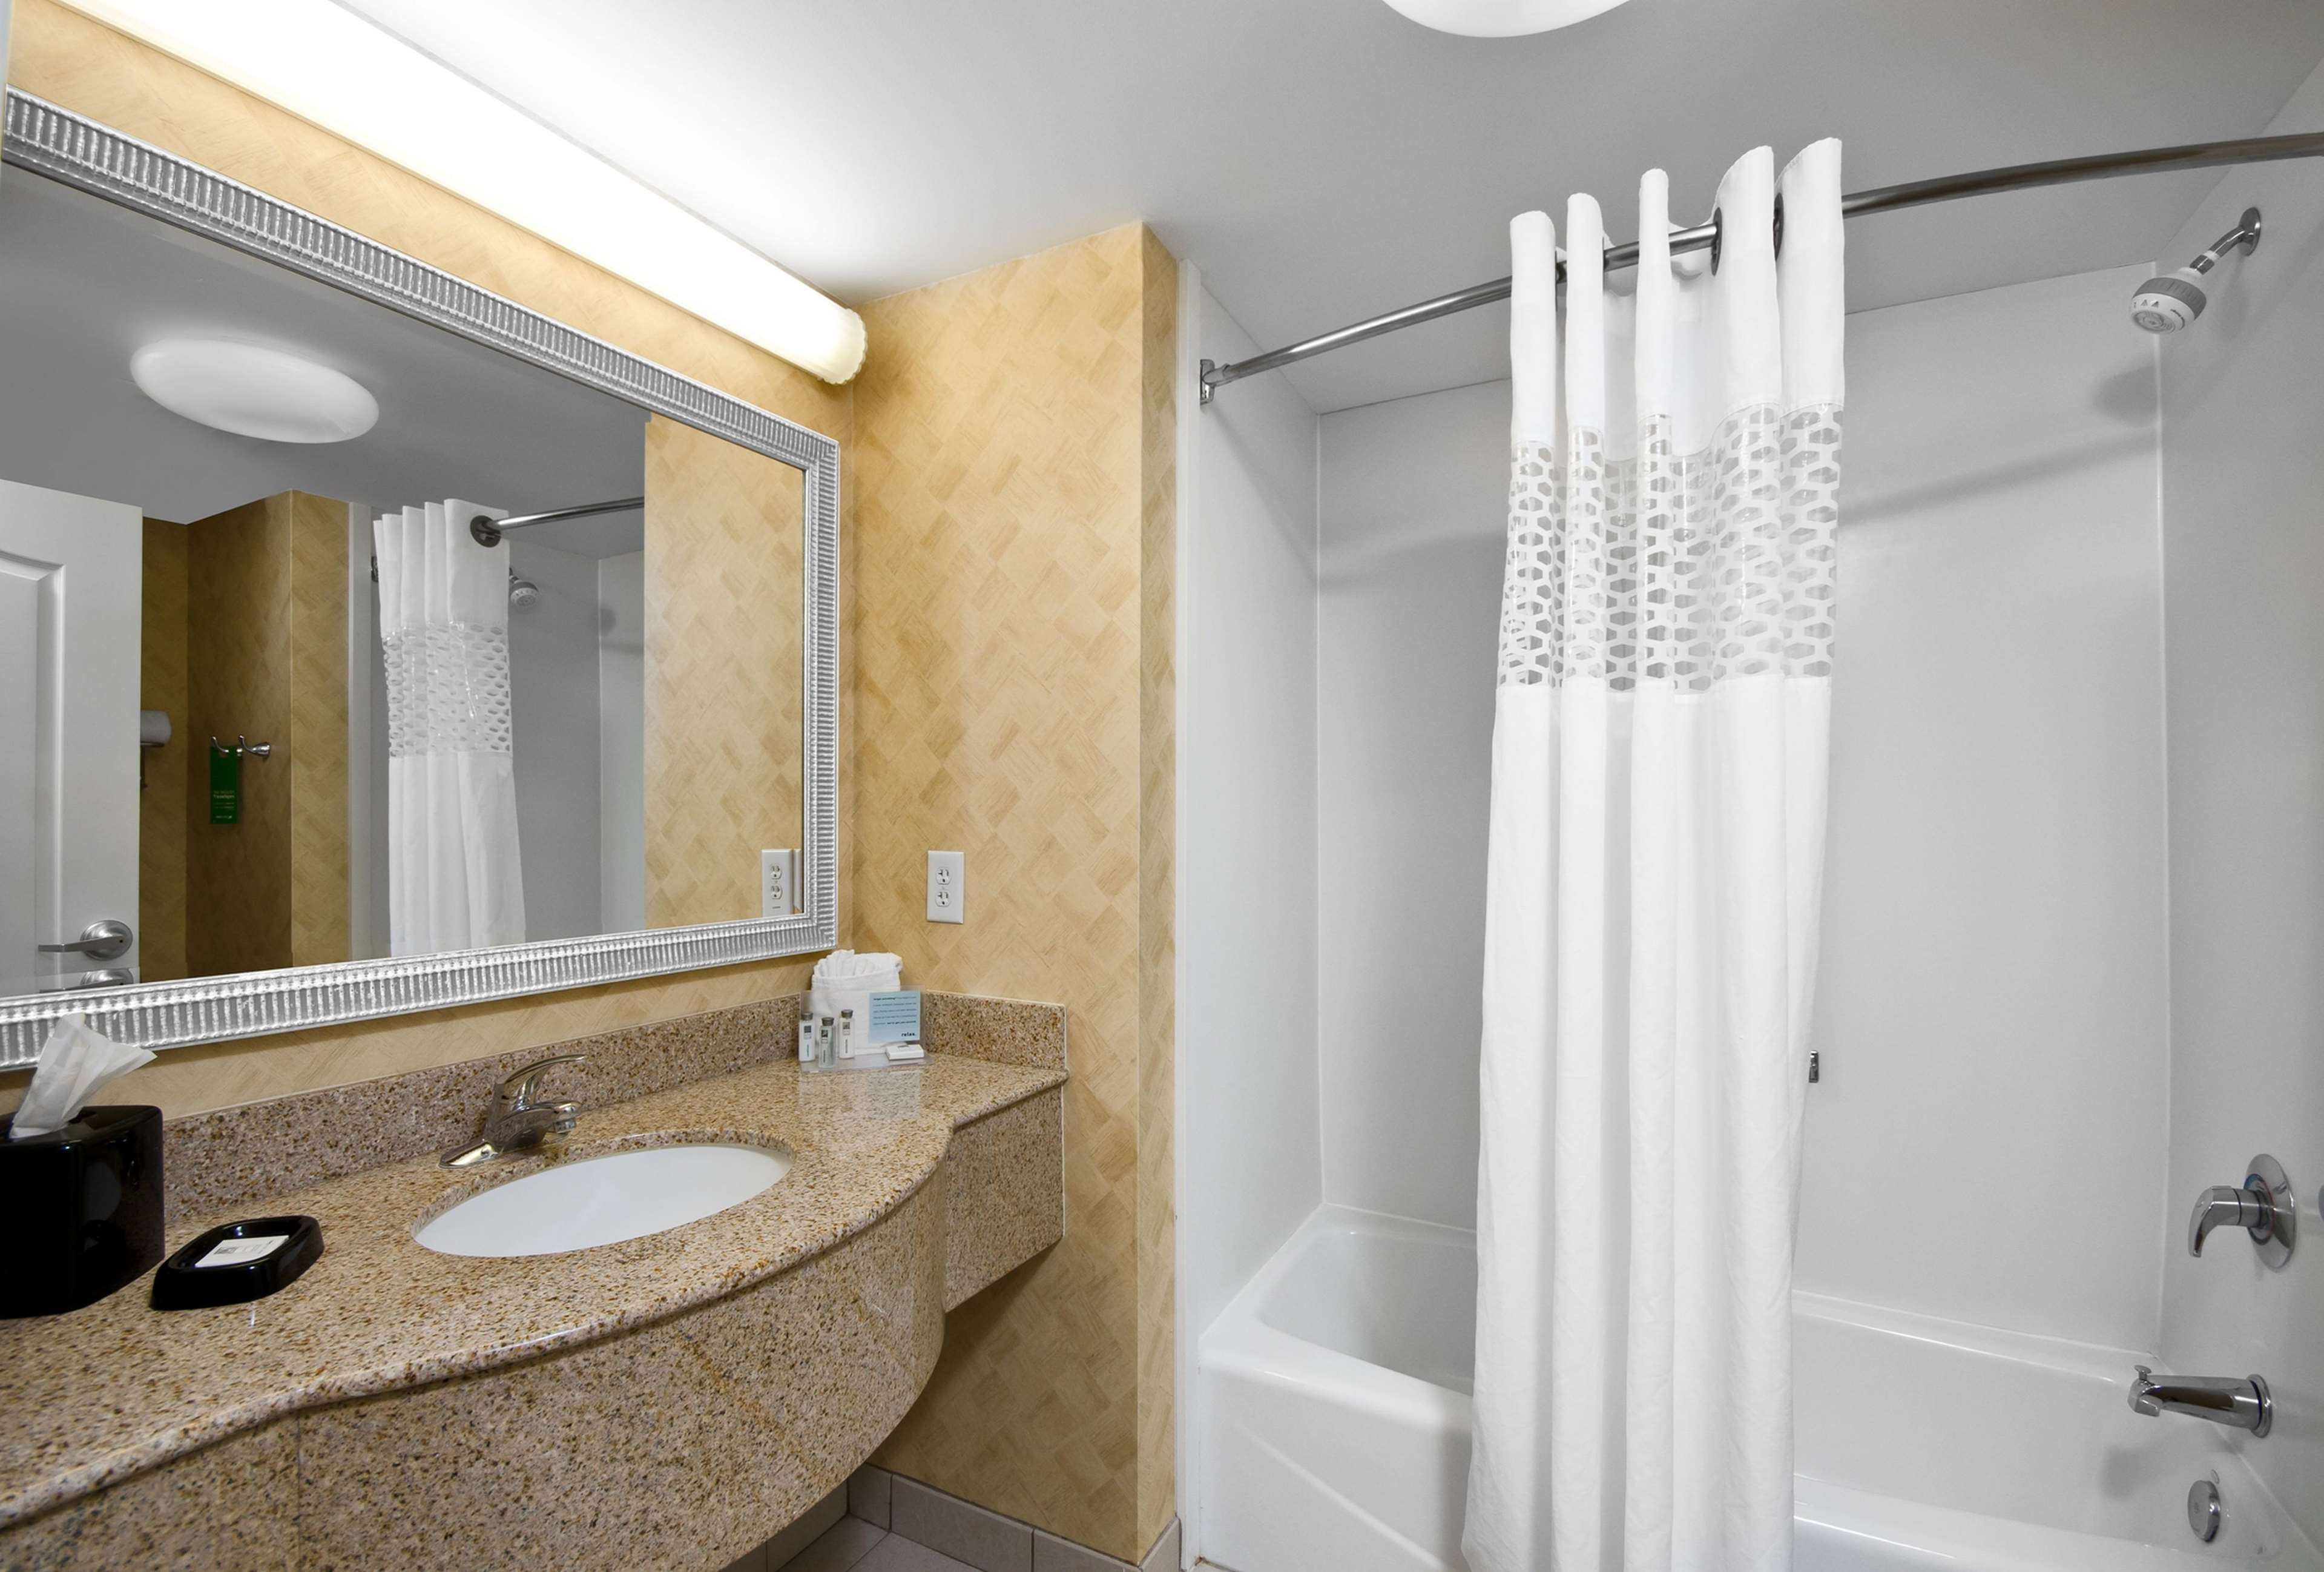 Hampton Inn & Suites Jacksonville South-St. Johns Town Center Area image 26